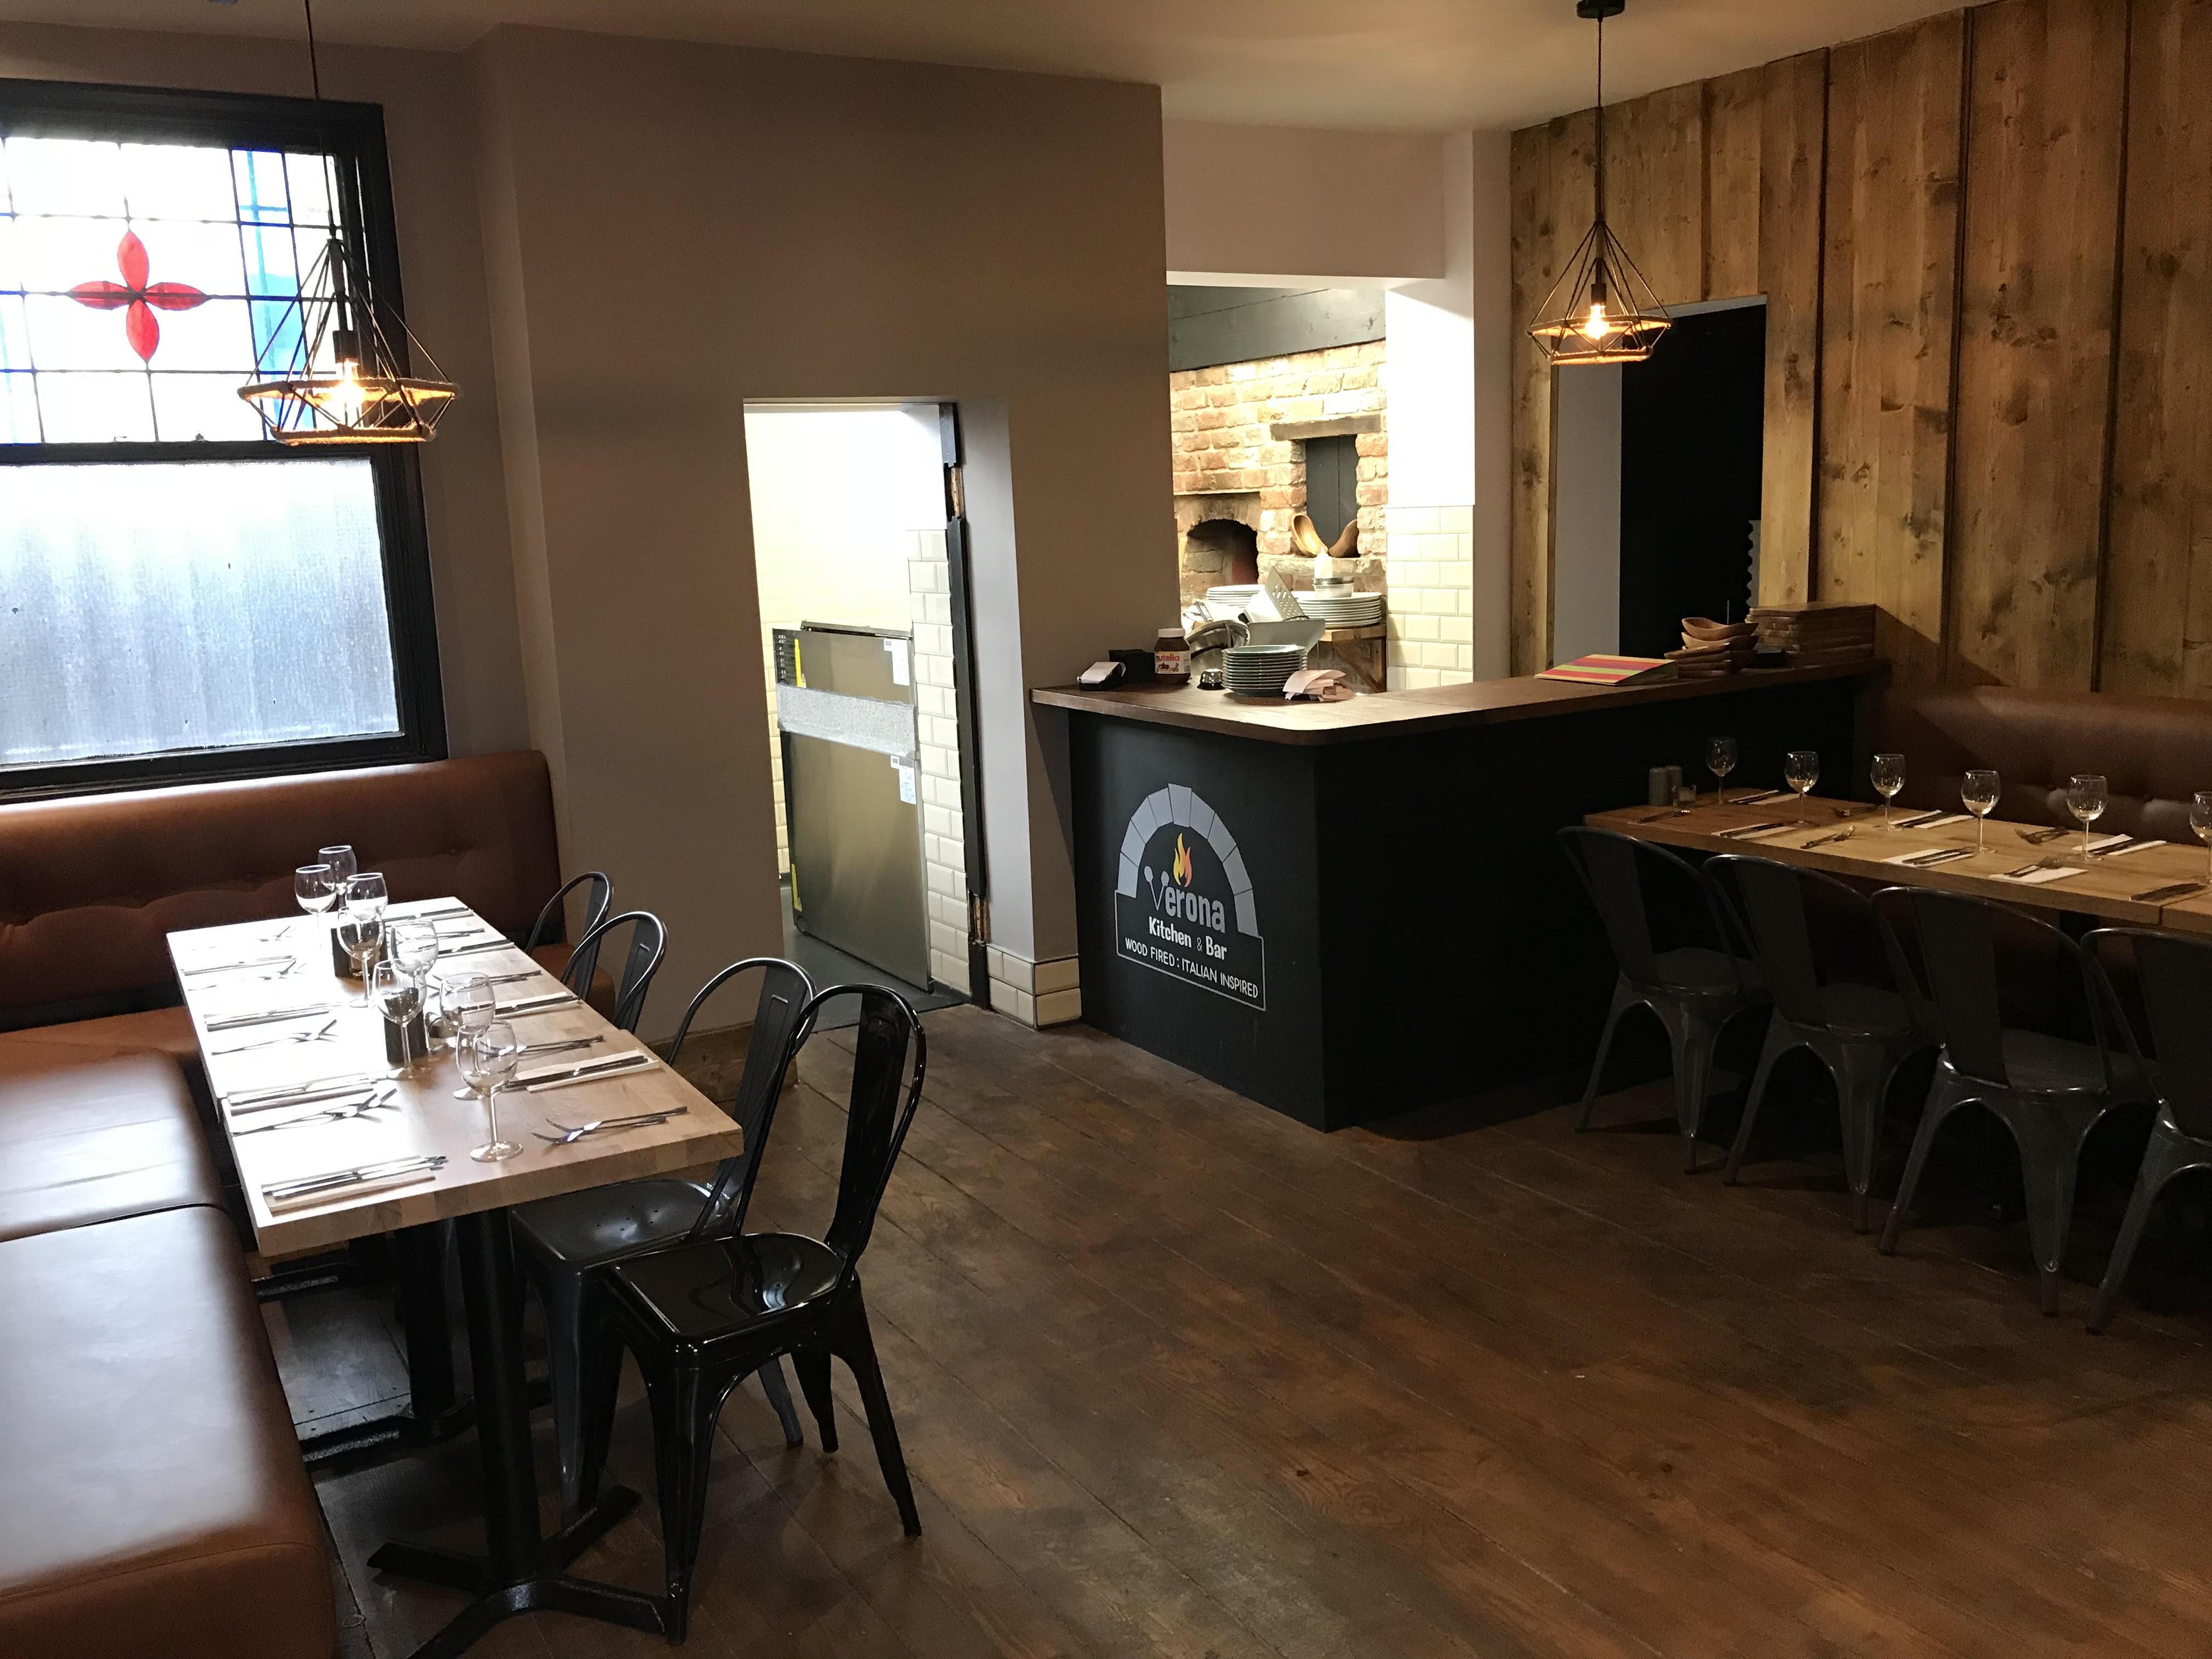 verona kitchen bar italian restaurant in newton le willows